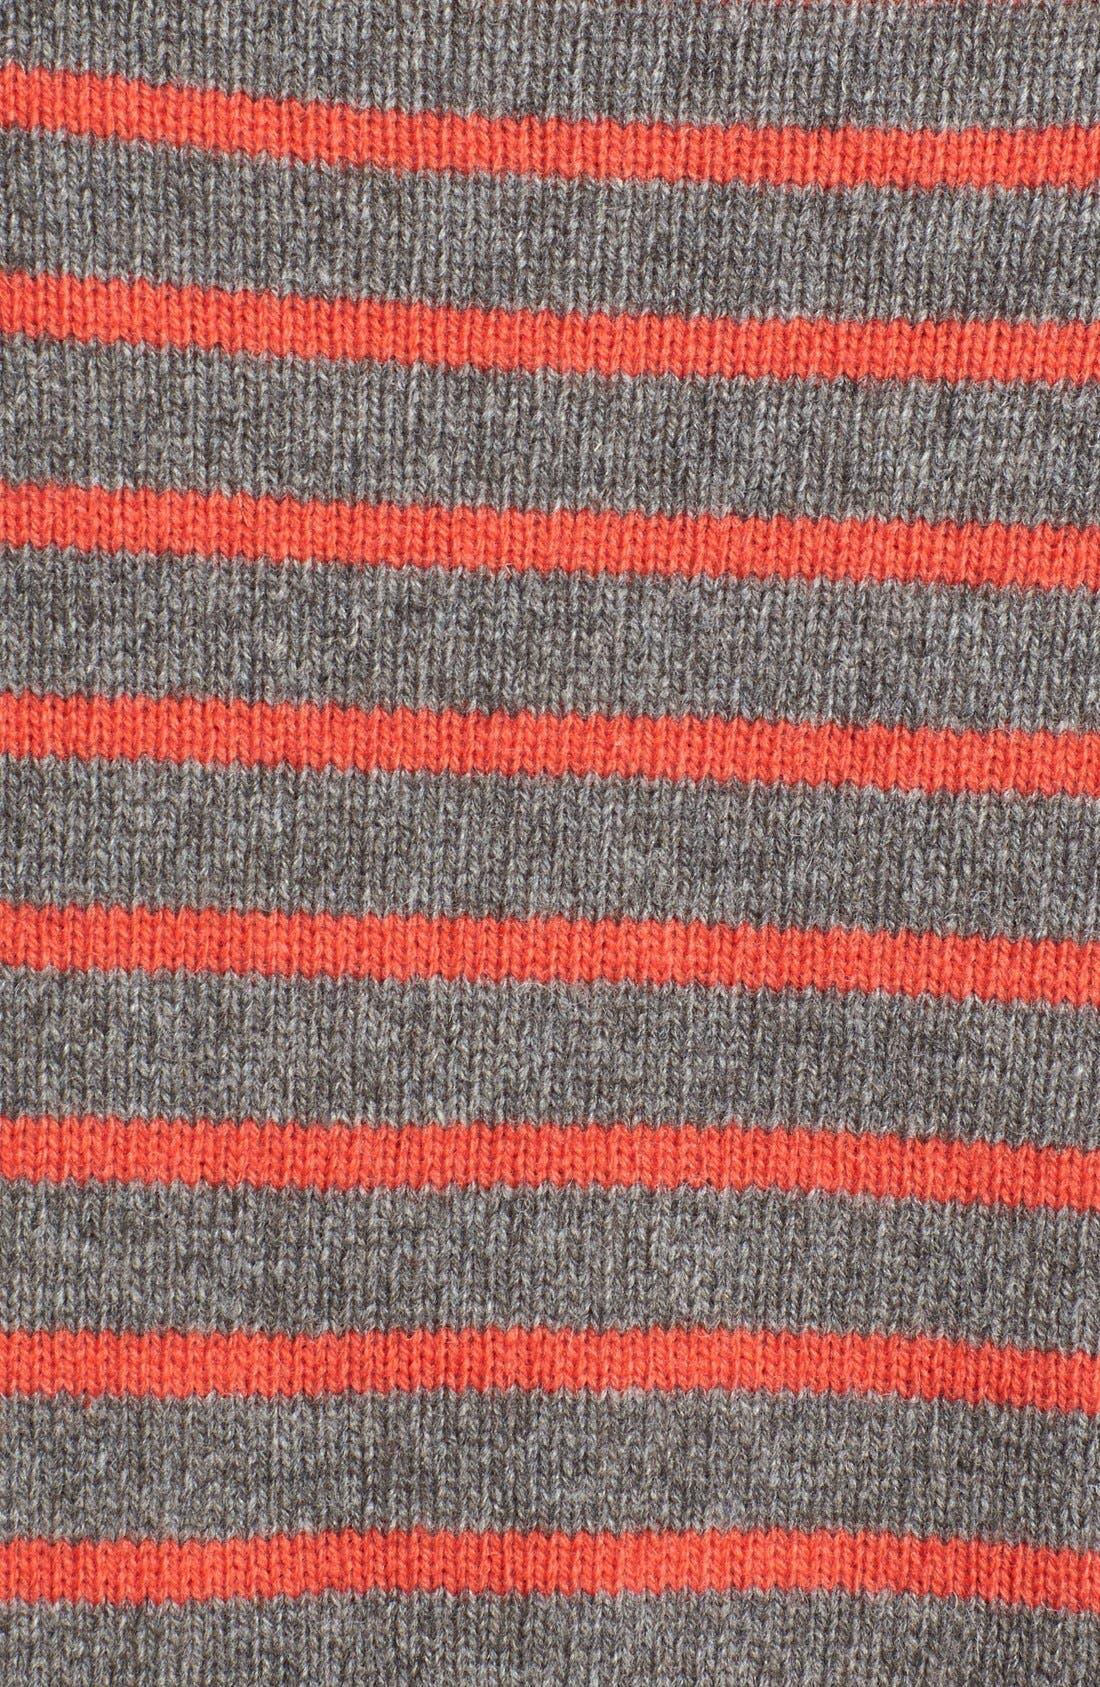 Alternate Image 3  - Eileen Fisher Bateau Neck Boxy Sweater (Regular & Petite)